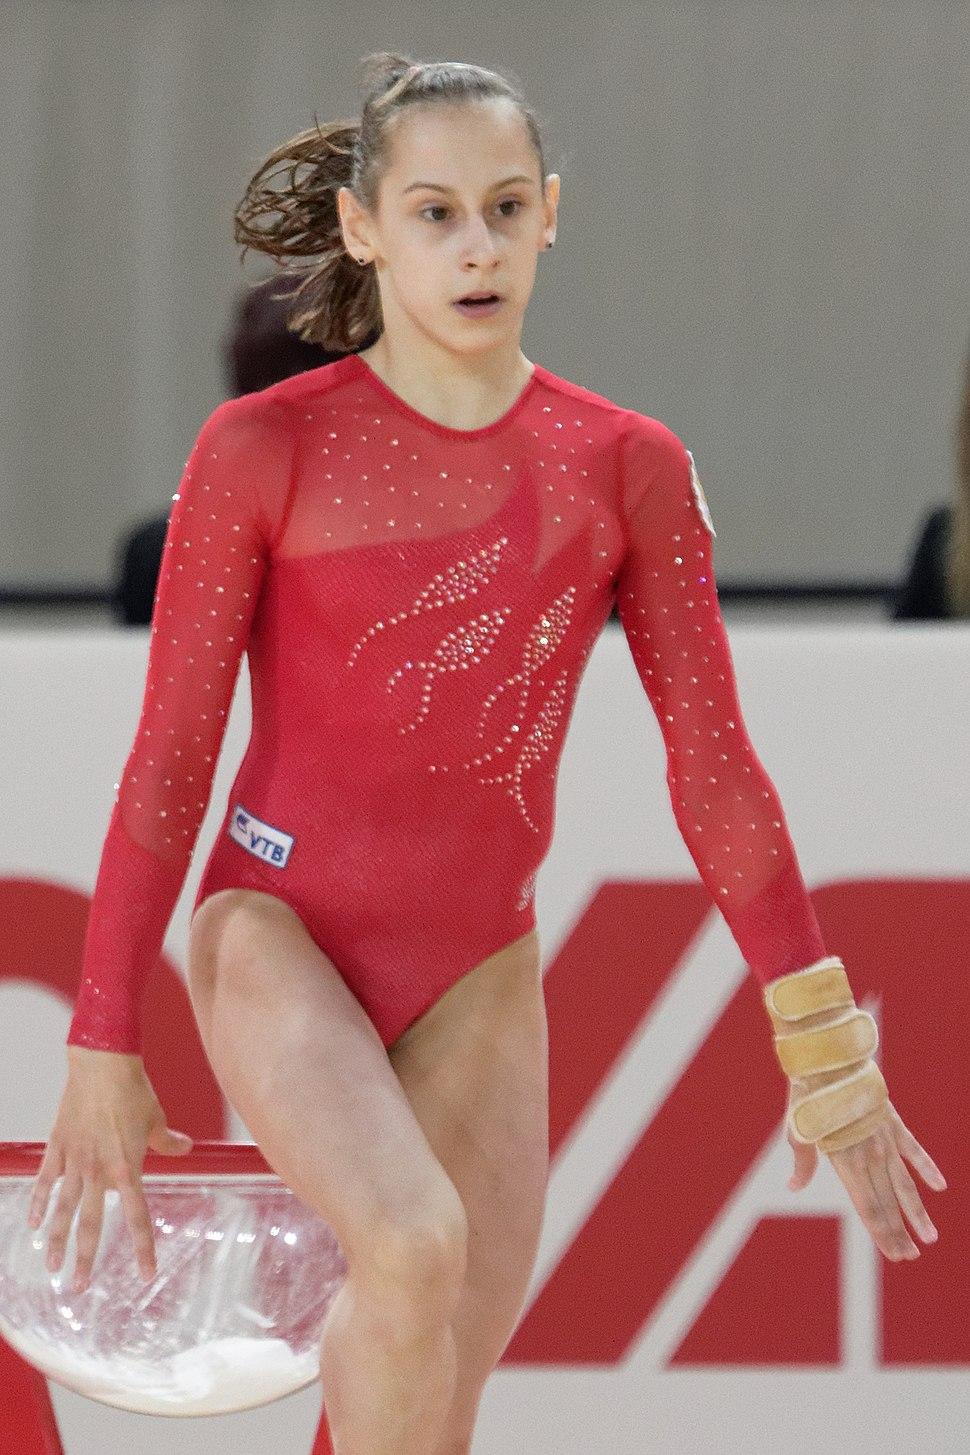 2015 European Artistic Gymnastics Championships - Floor - Maria Kharenkova 03